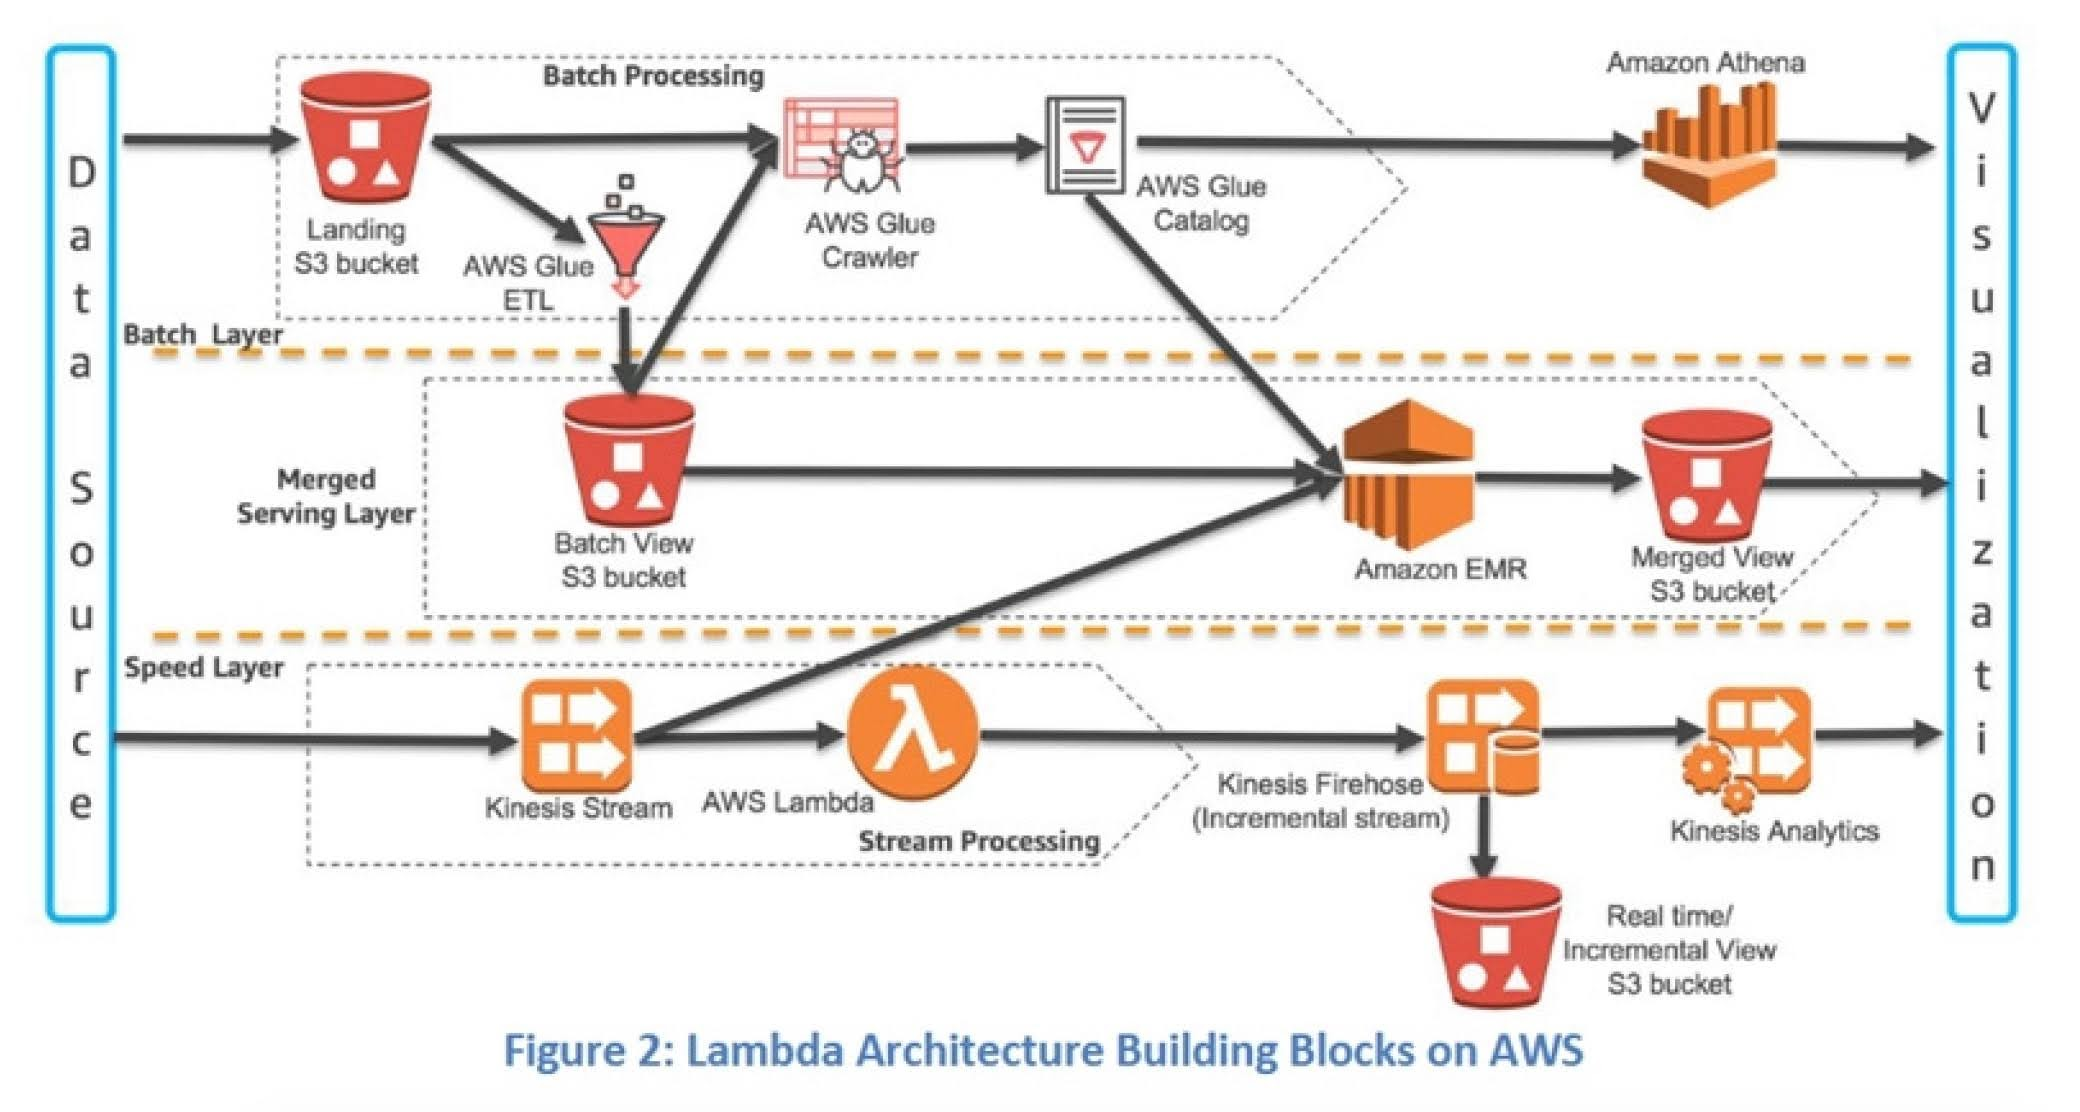 Lambda architecture building blocks on AWS